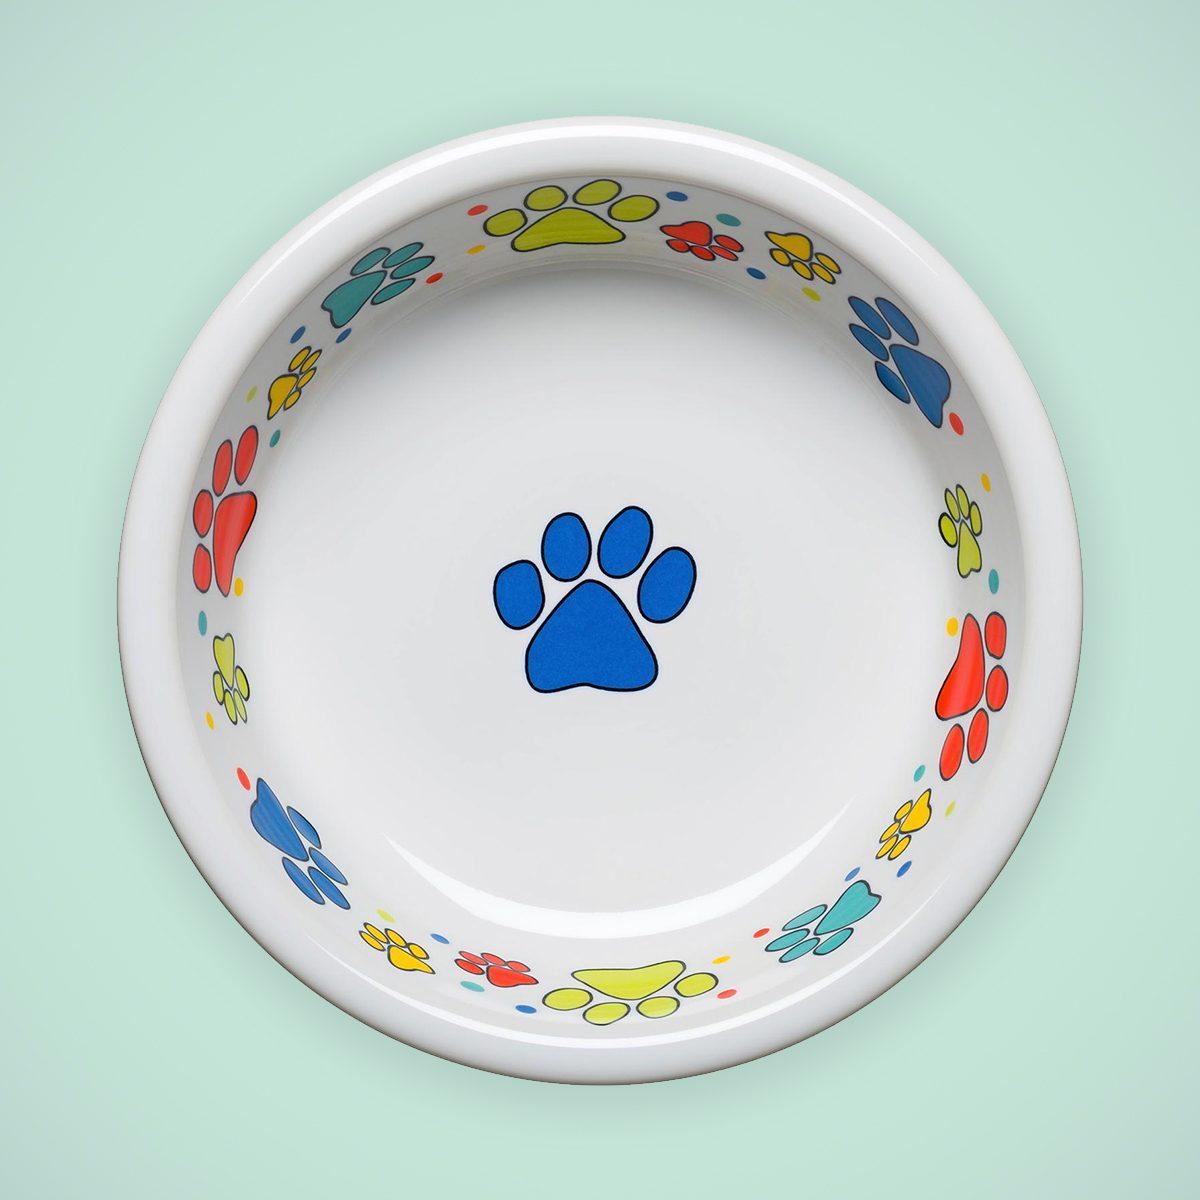 fiesta dog bowl